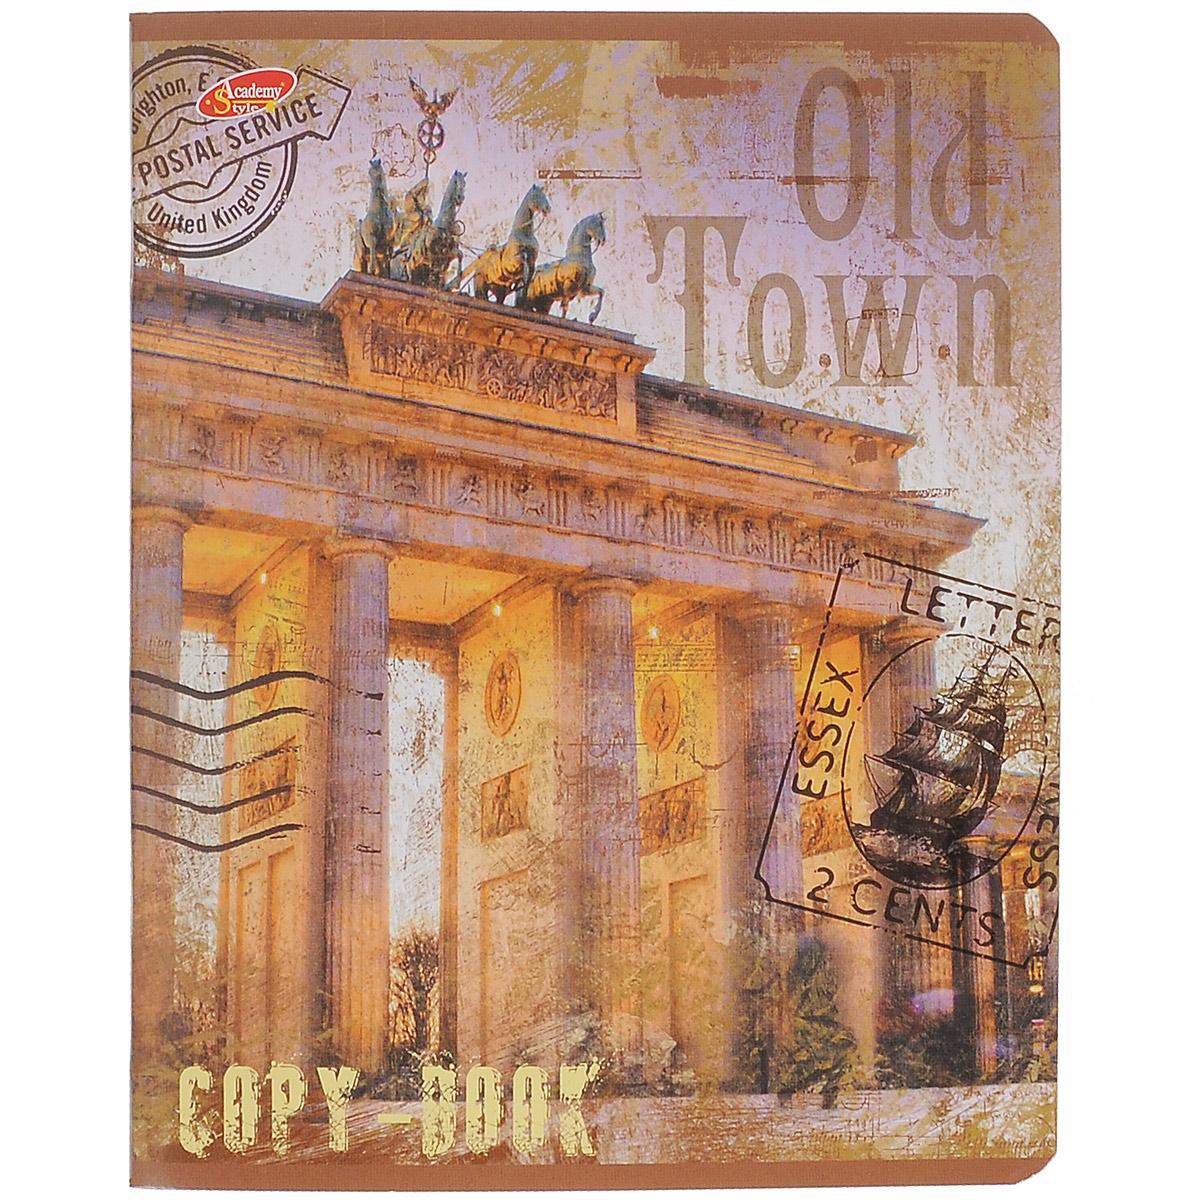 old town oldtown 600g Тетрадь Old Town, 80 листов, формат А5, цвет: коричневый. Вид 1